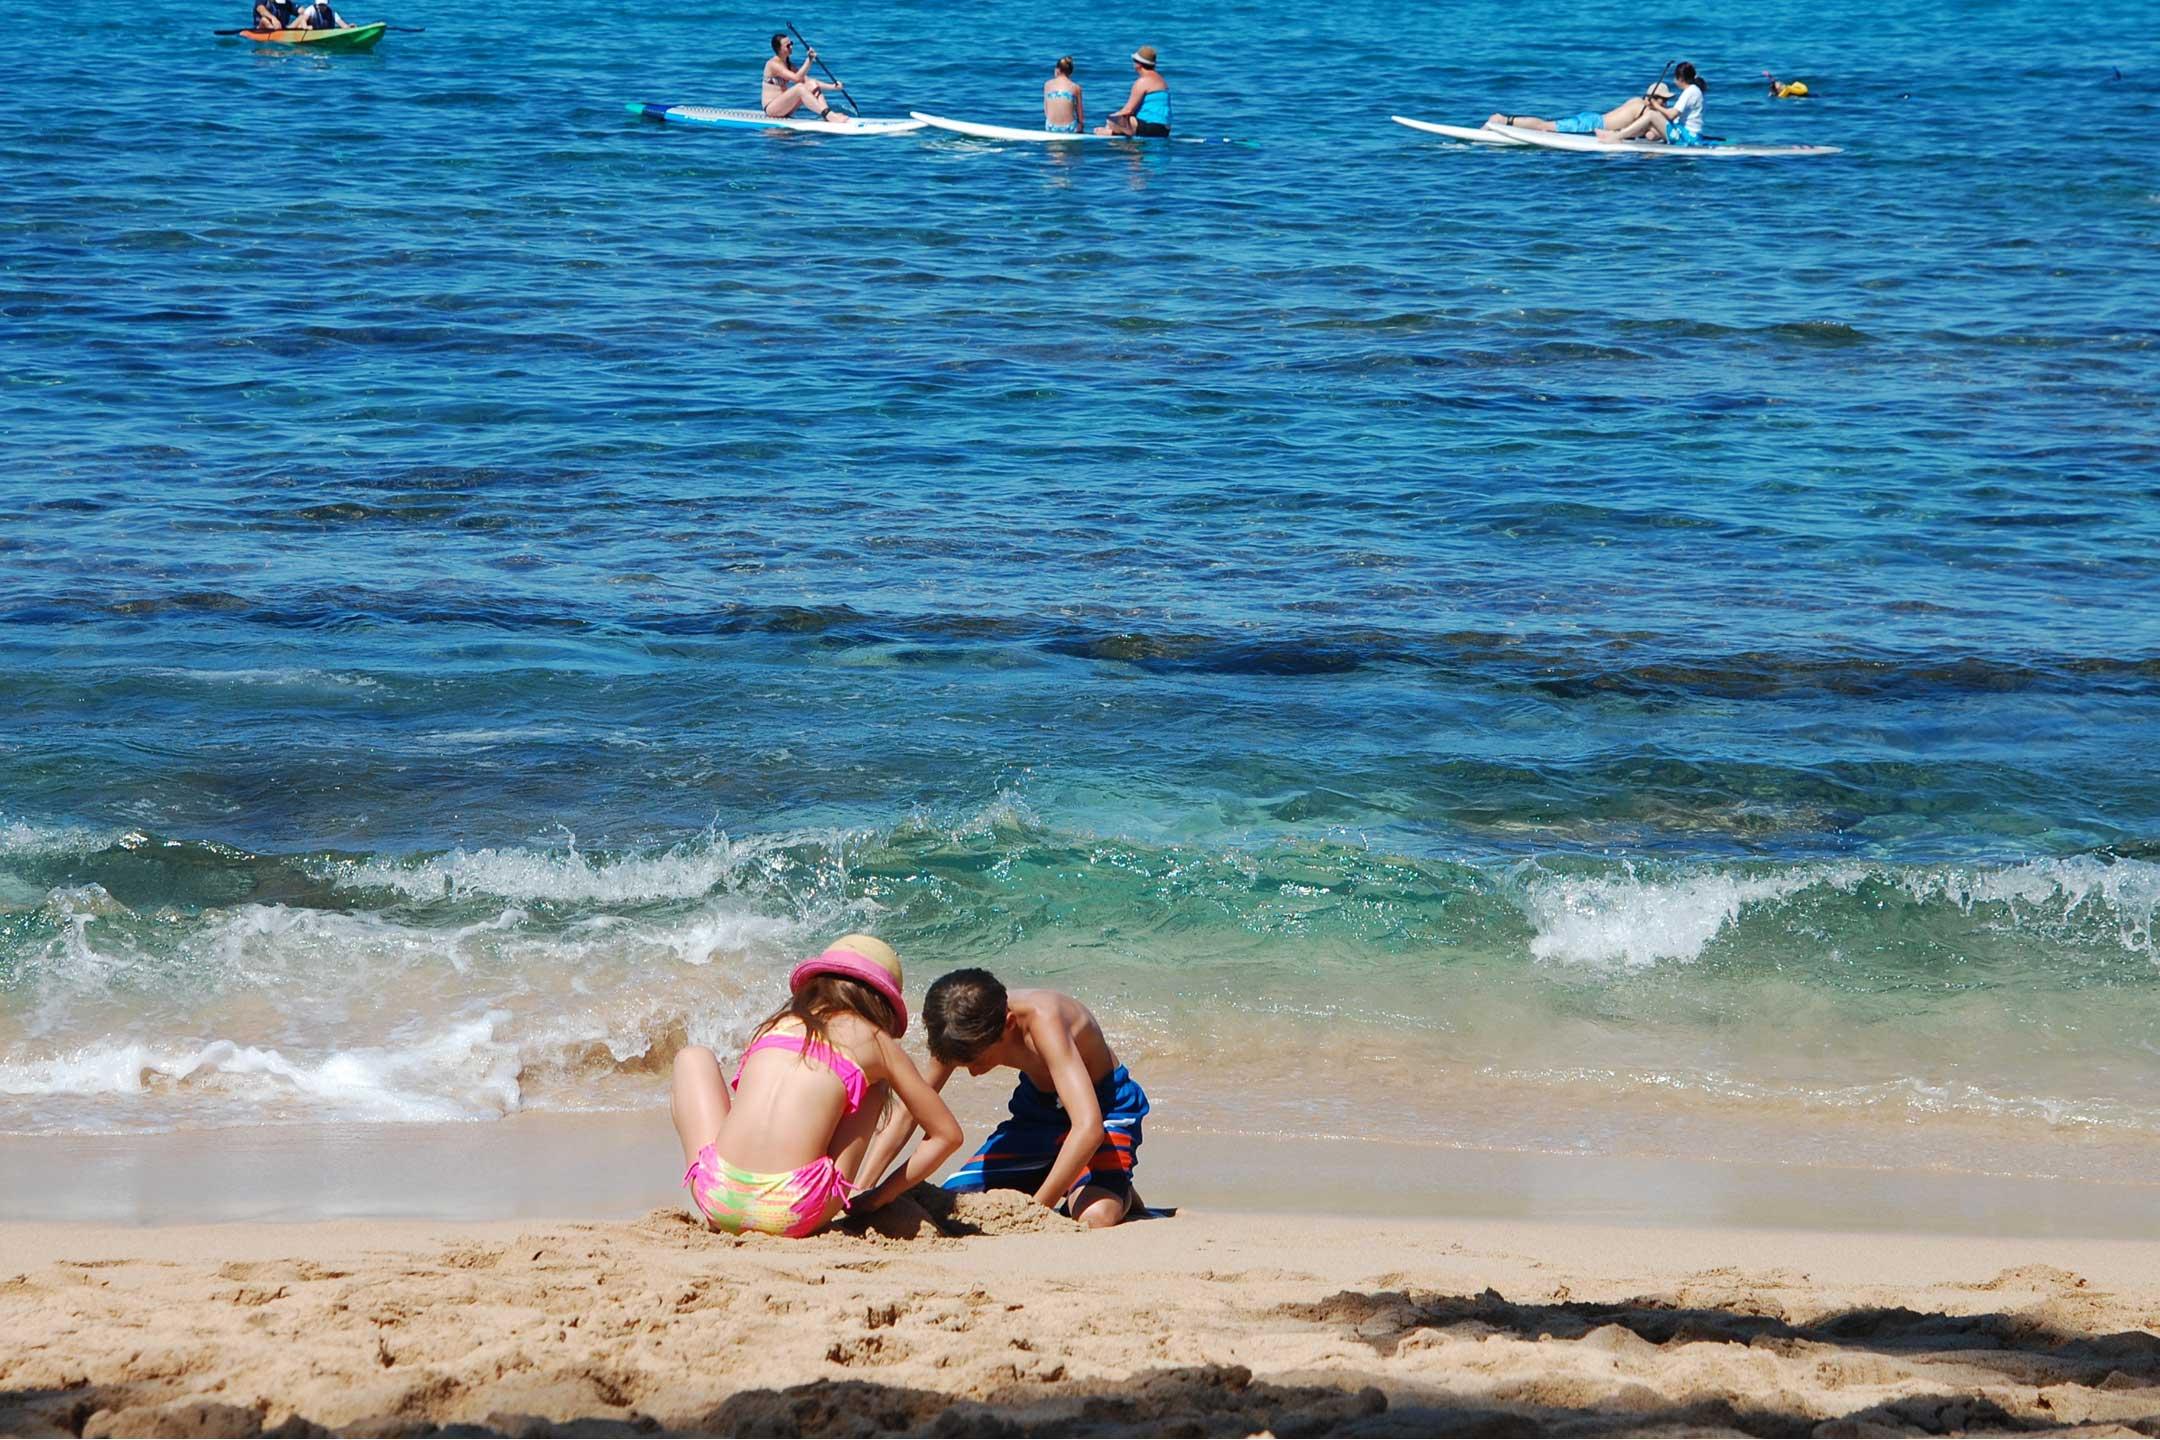 kids-on-beach-playing2160